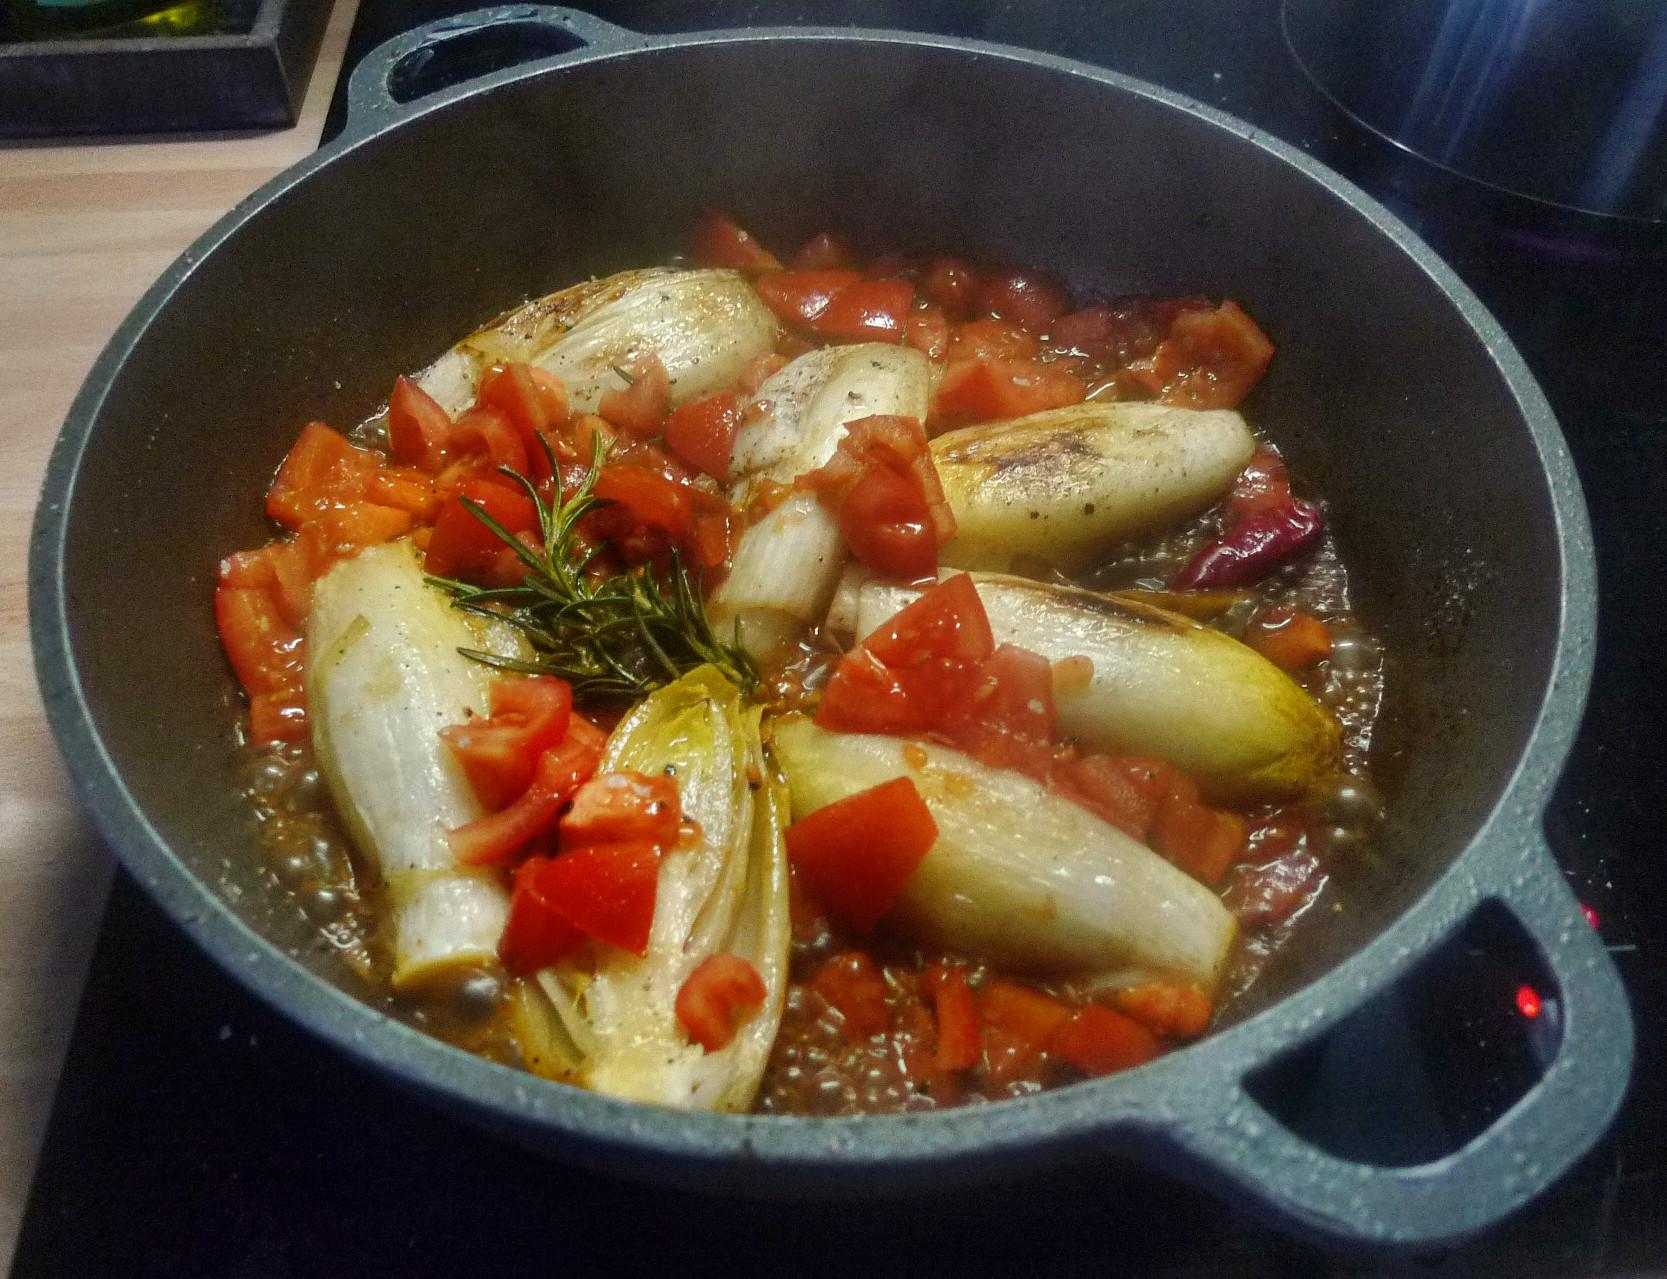 Chicoree,Salzkartoffeln,Pflaumenkompott,vegetarisch - 28.2.15   (8)